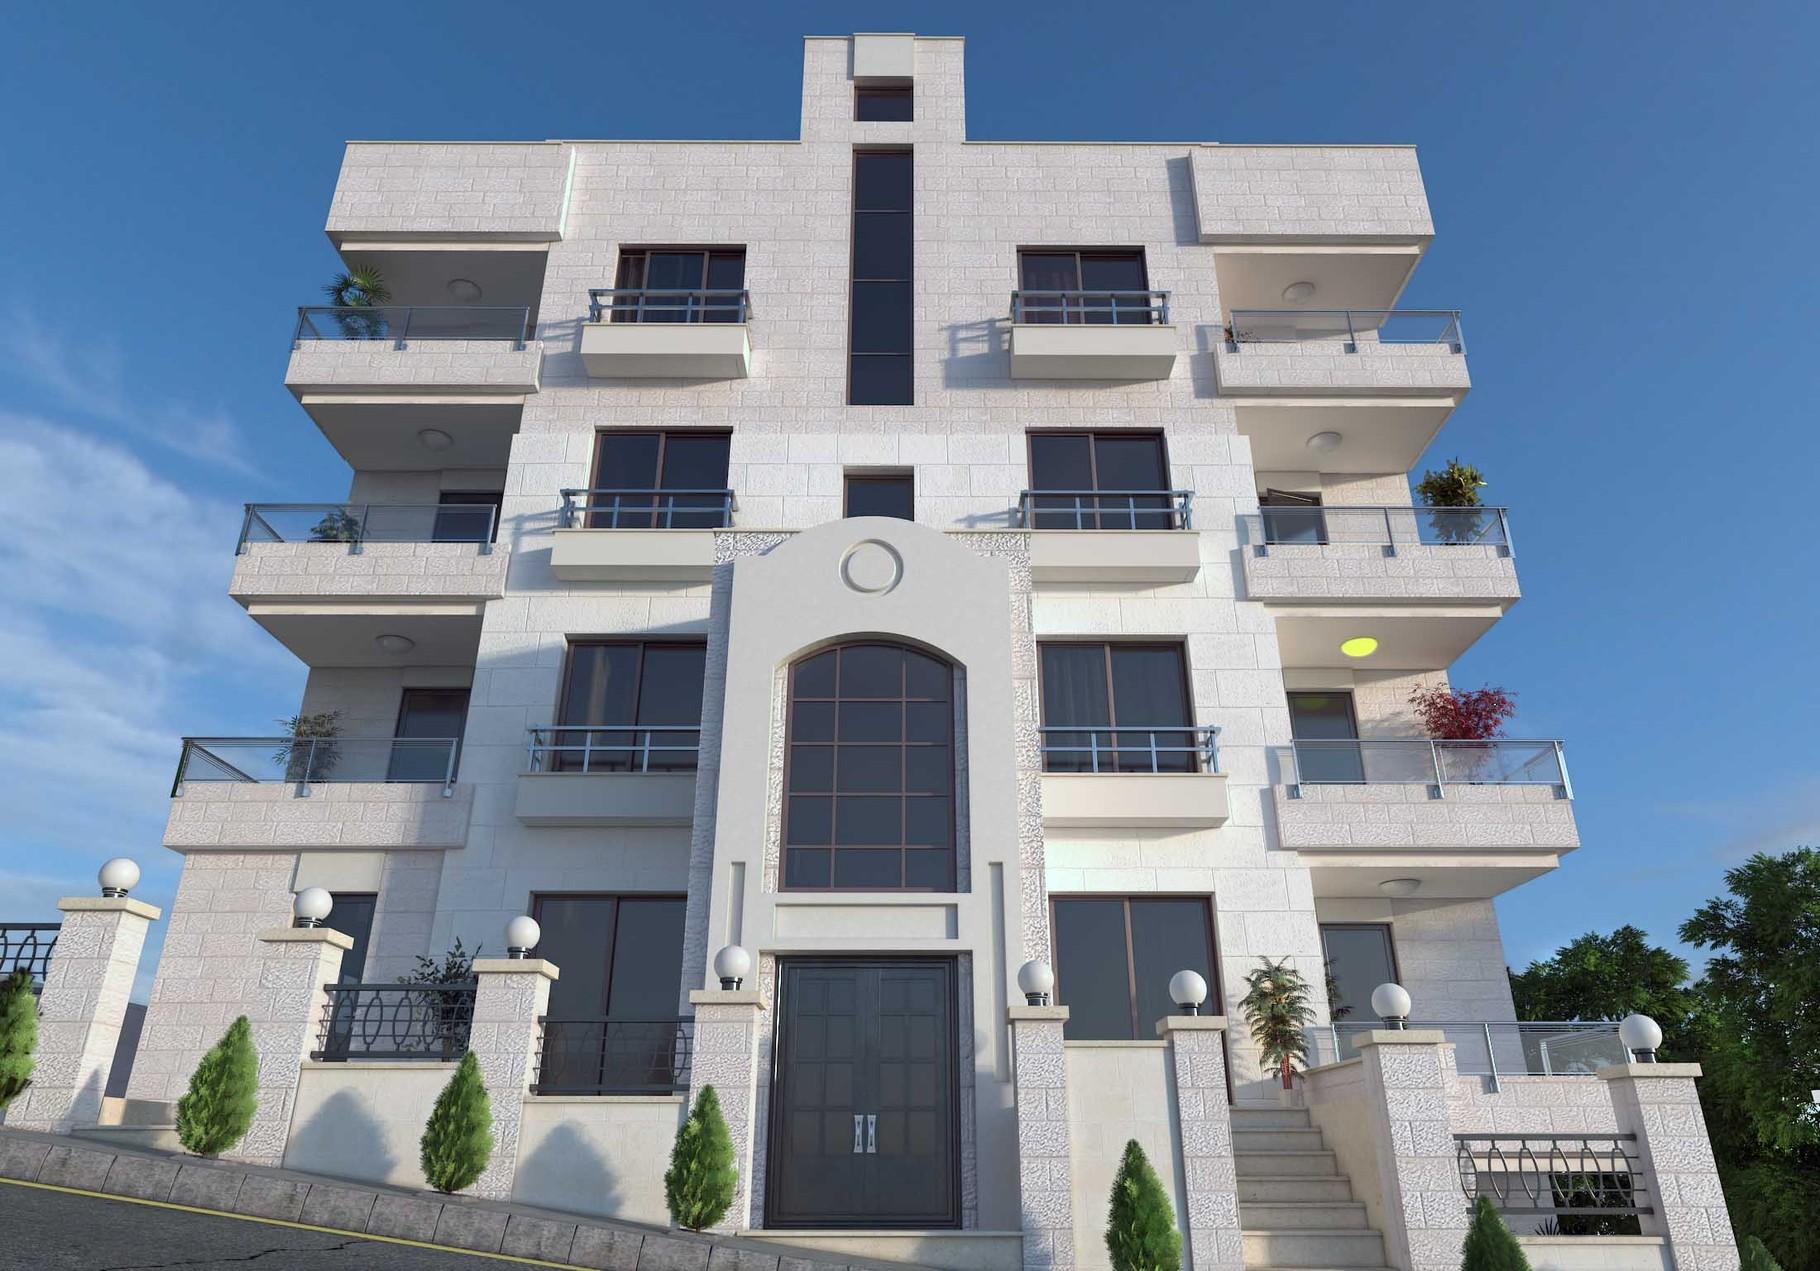 Asfoor Housing company - Jordan